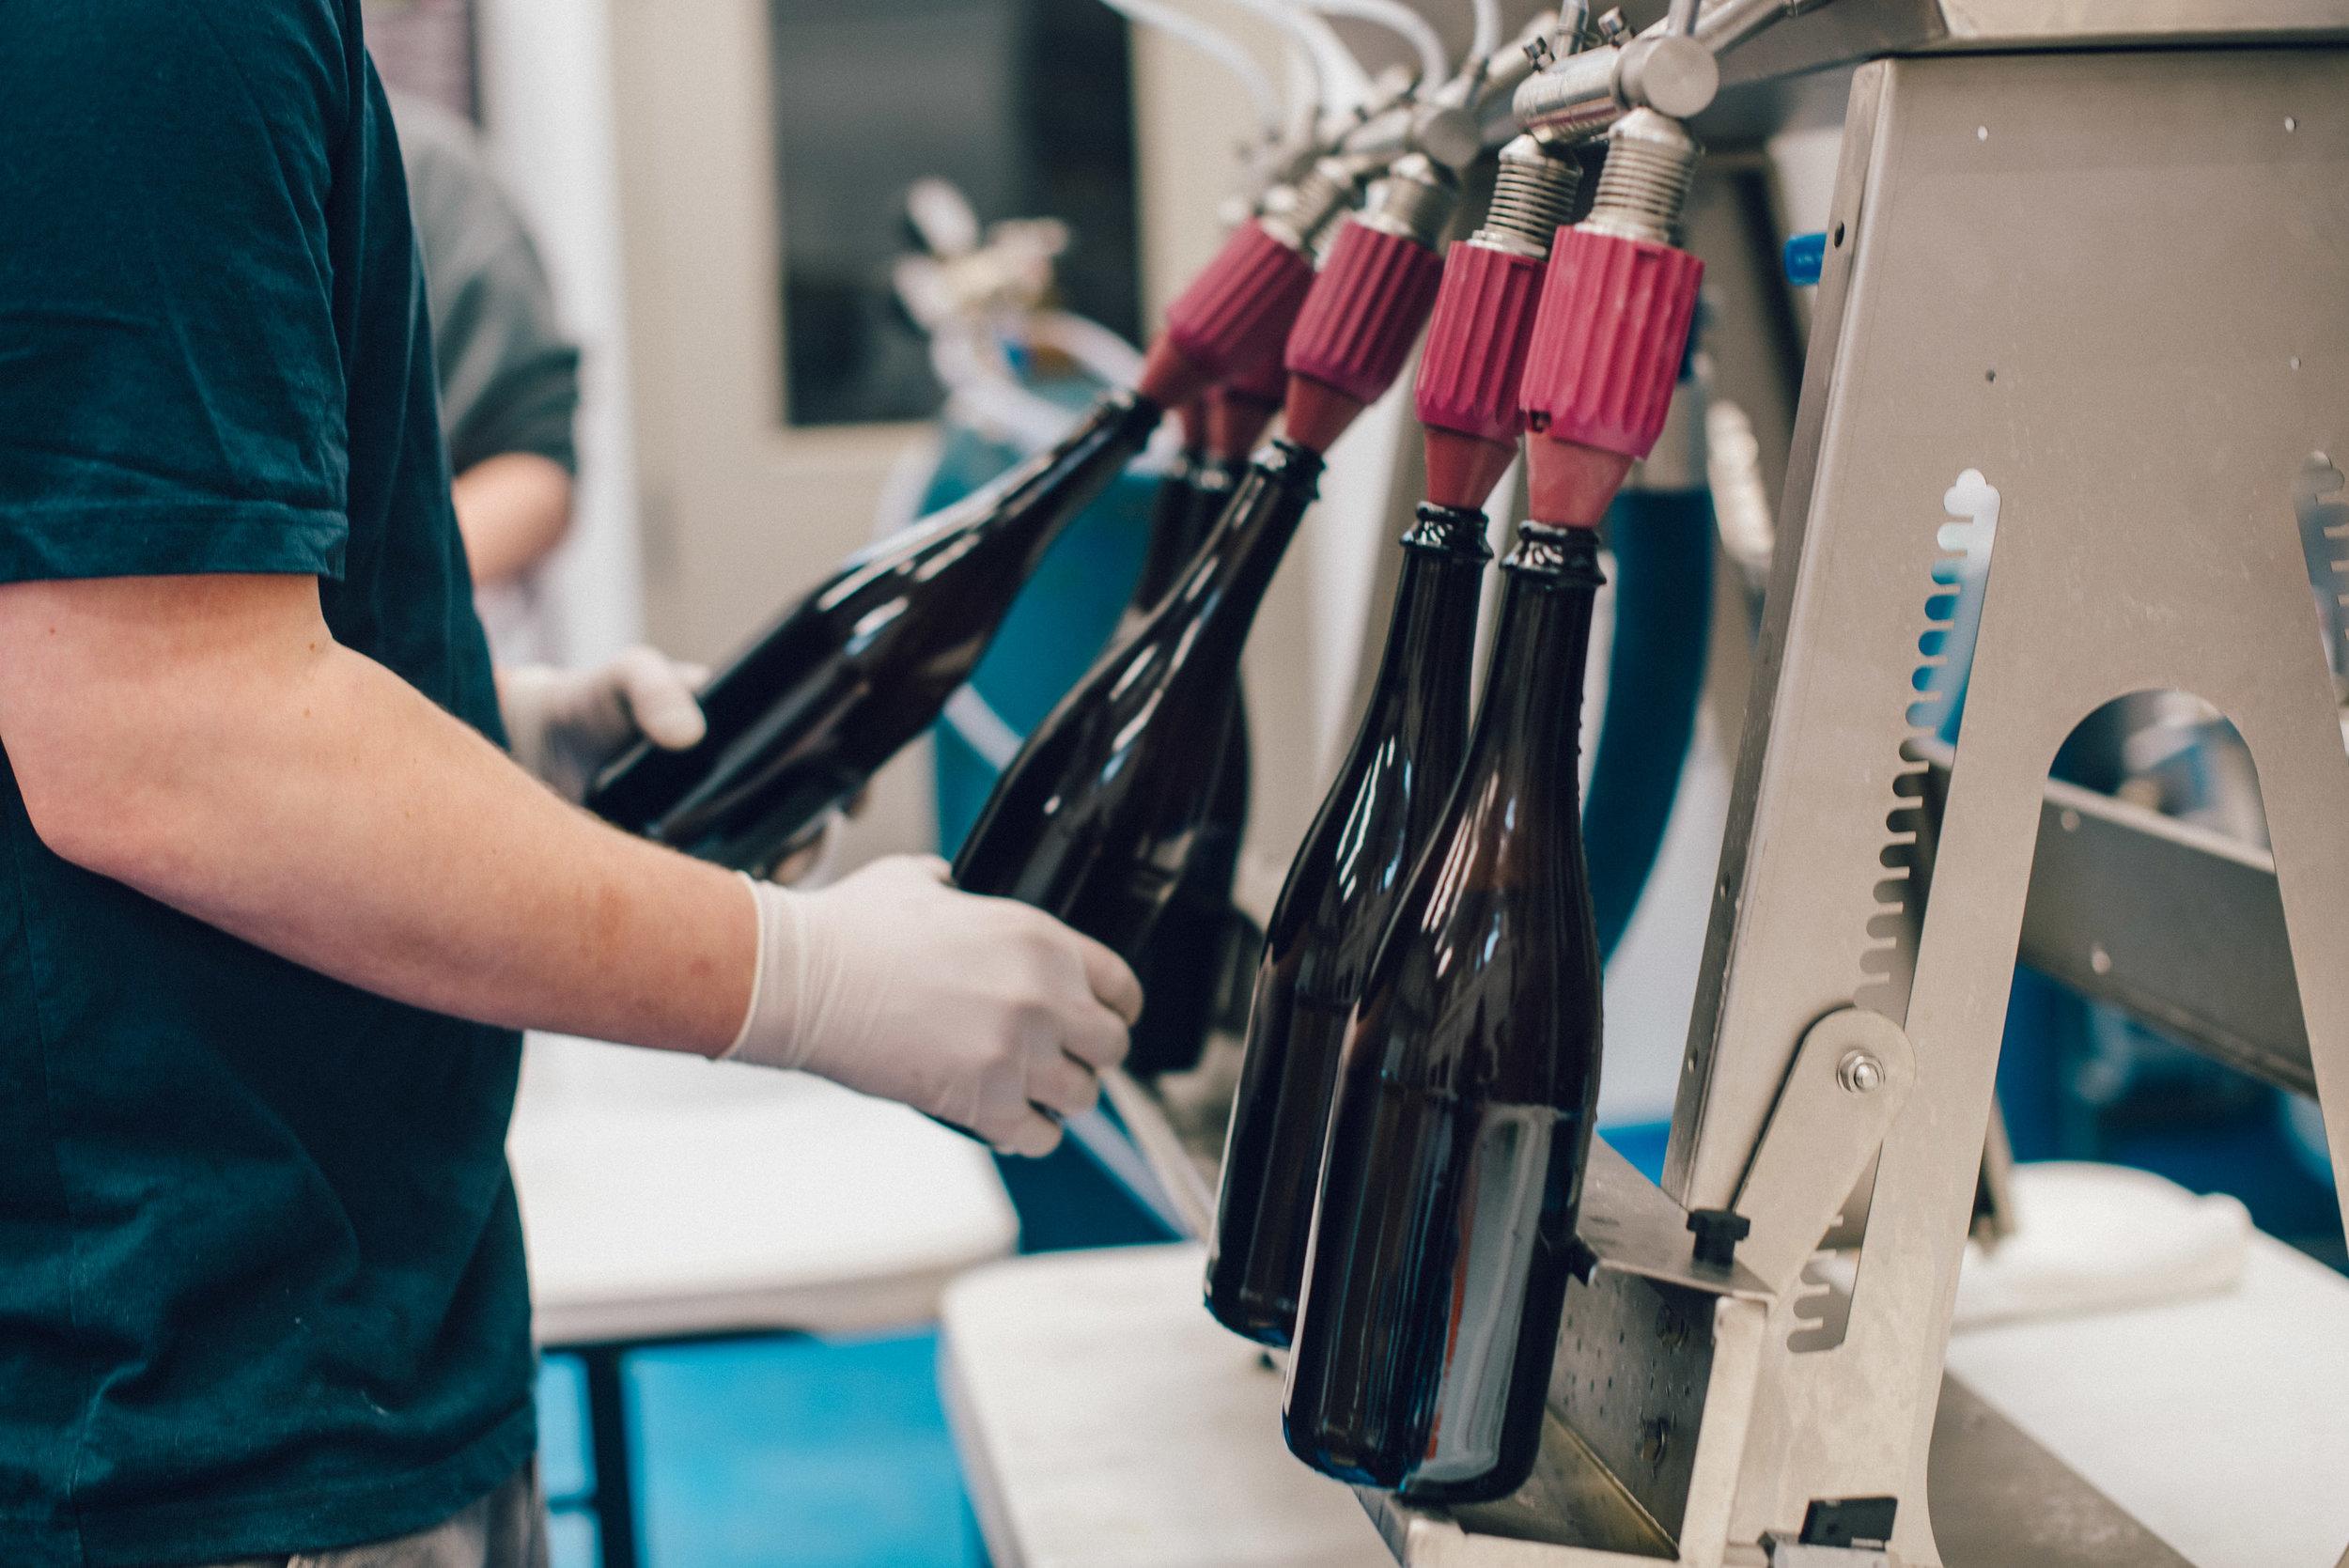 Hacienda-Beer-Co-Bottling-Le-Printemps-2.jpg